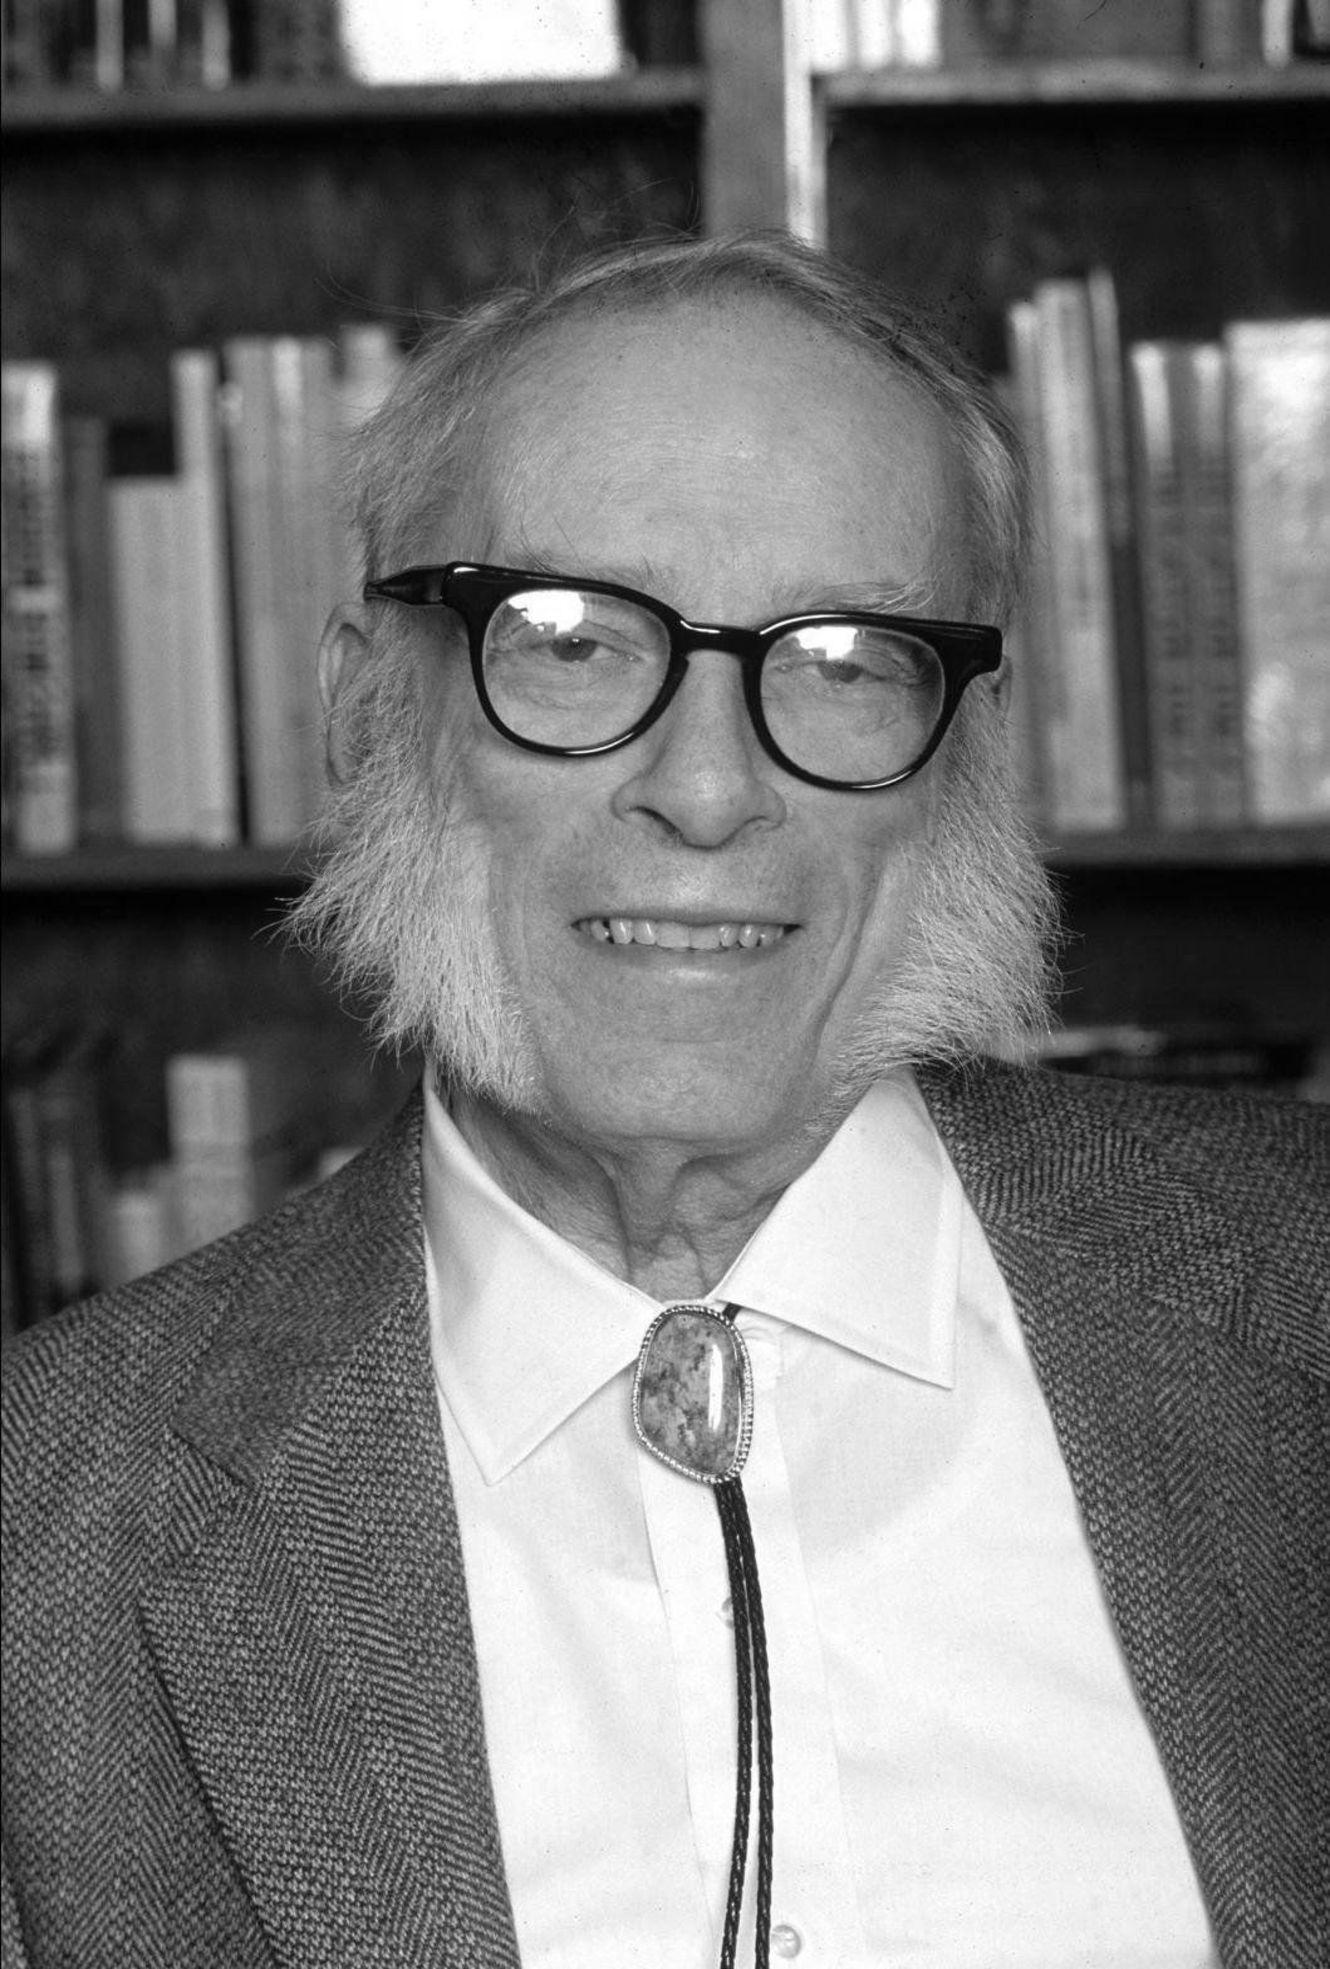 Profesör Isaac Asimov (1920 - 1992)